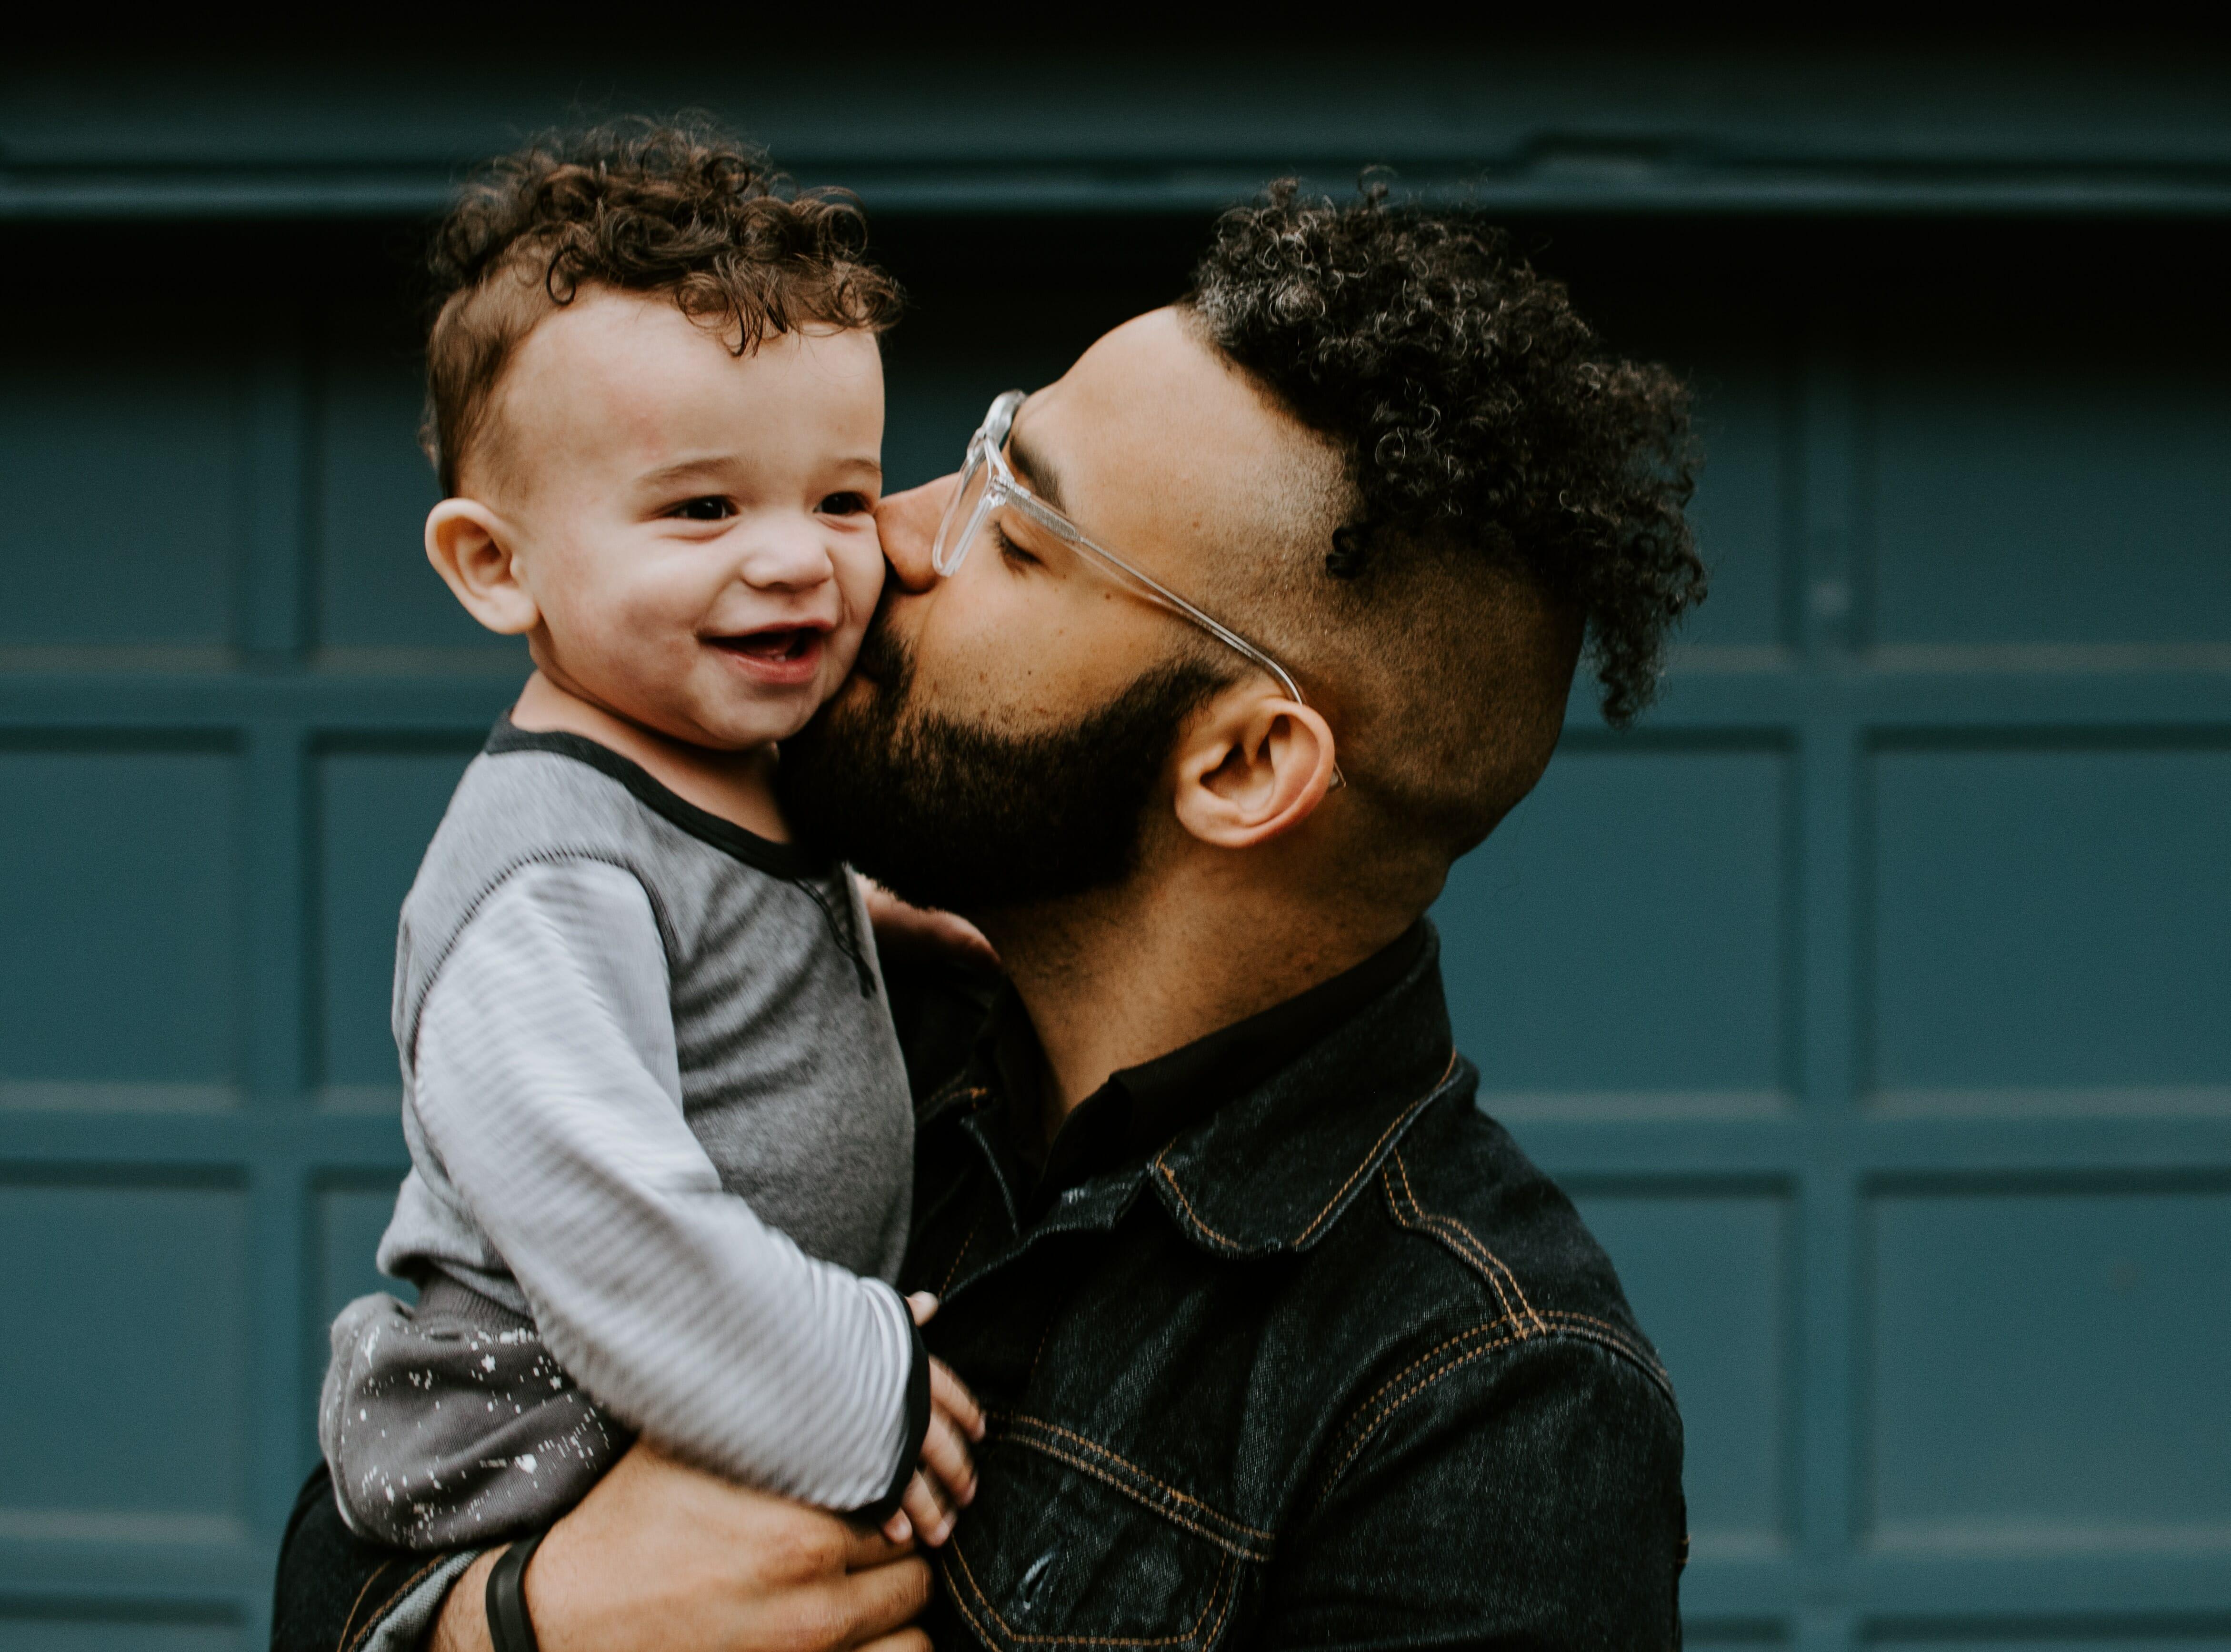 Man hugs his son